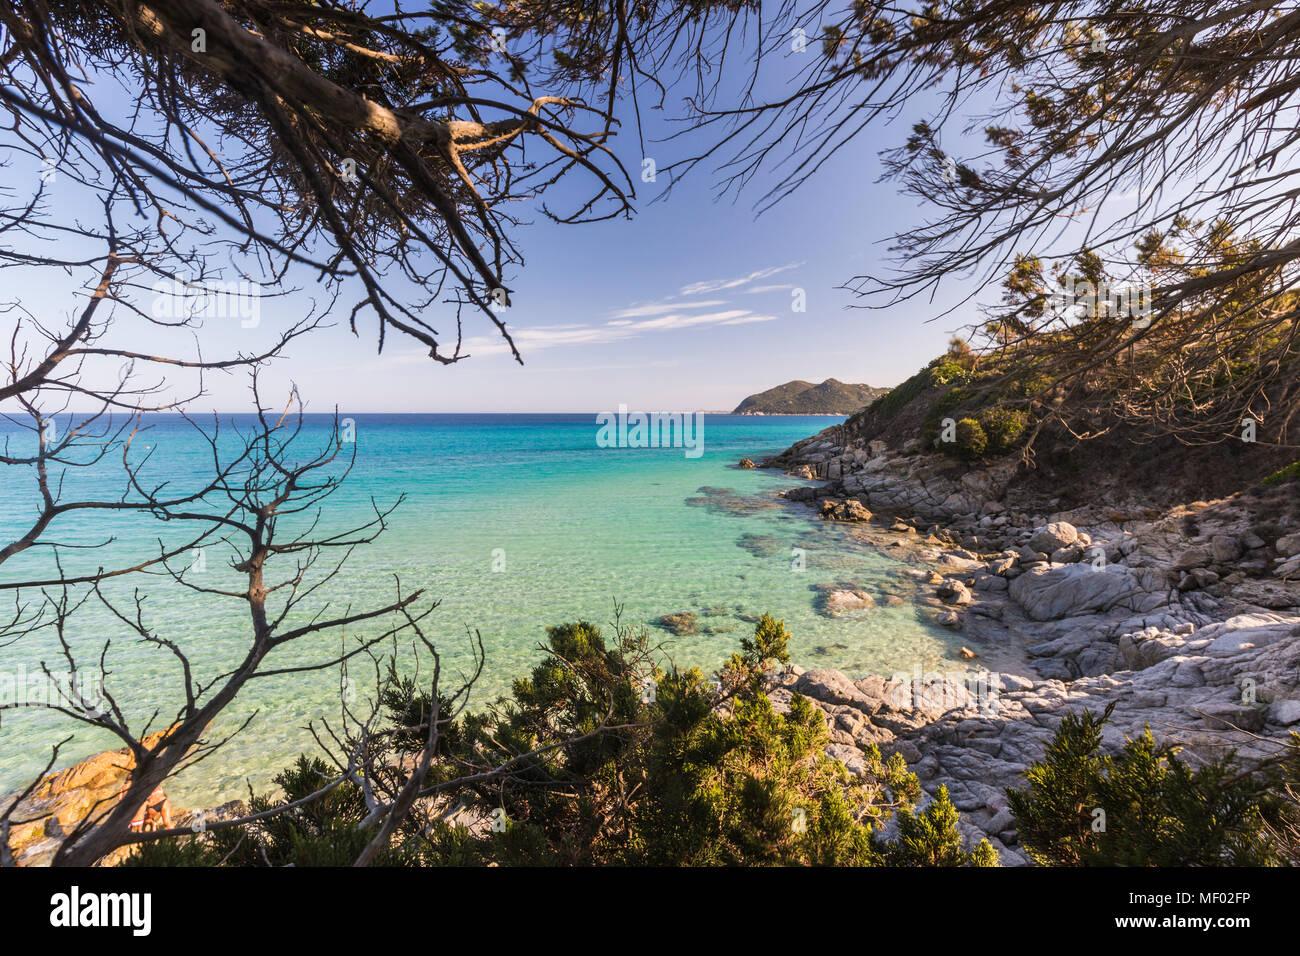 The mediterranean vegetation frames the turquoise sea of Cala Monte Turno Castiadas Cagliari Sardinia Italy Europe - Stock Image